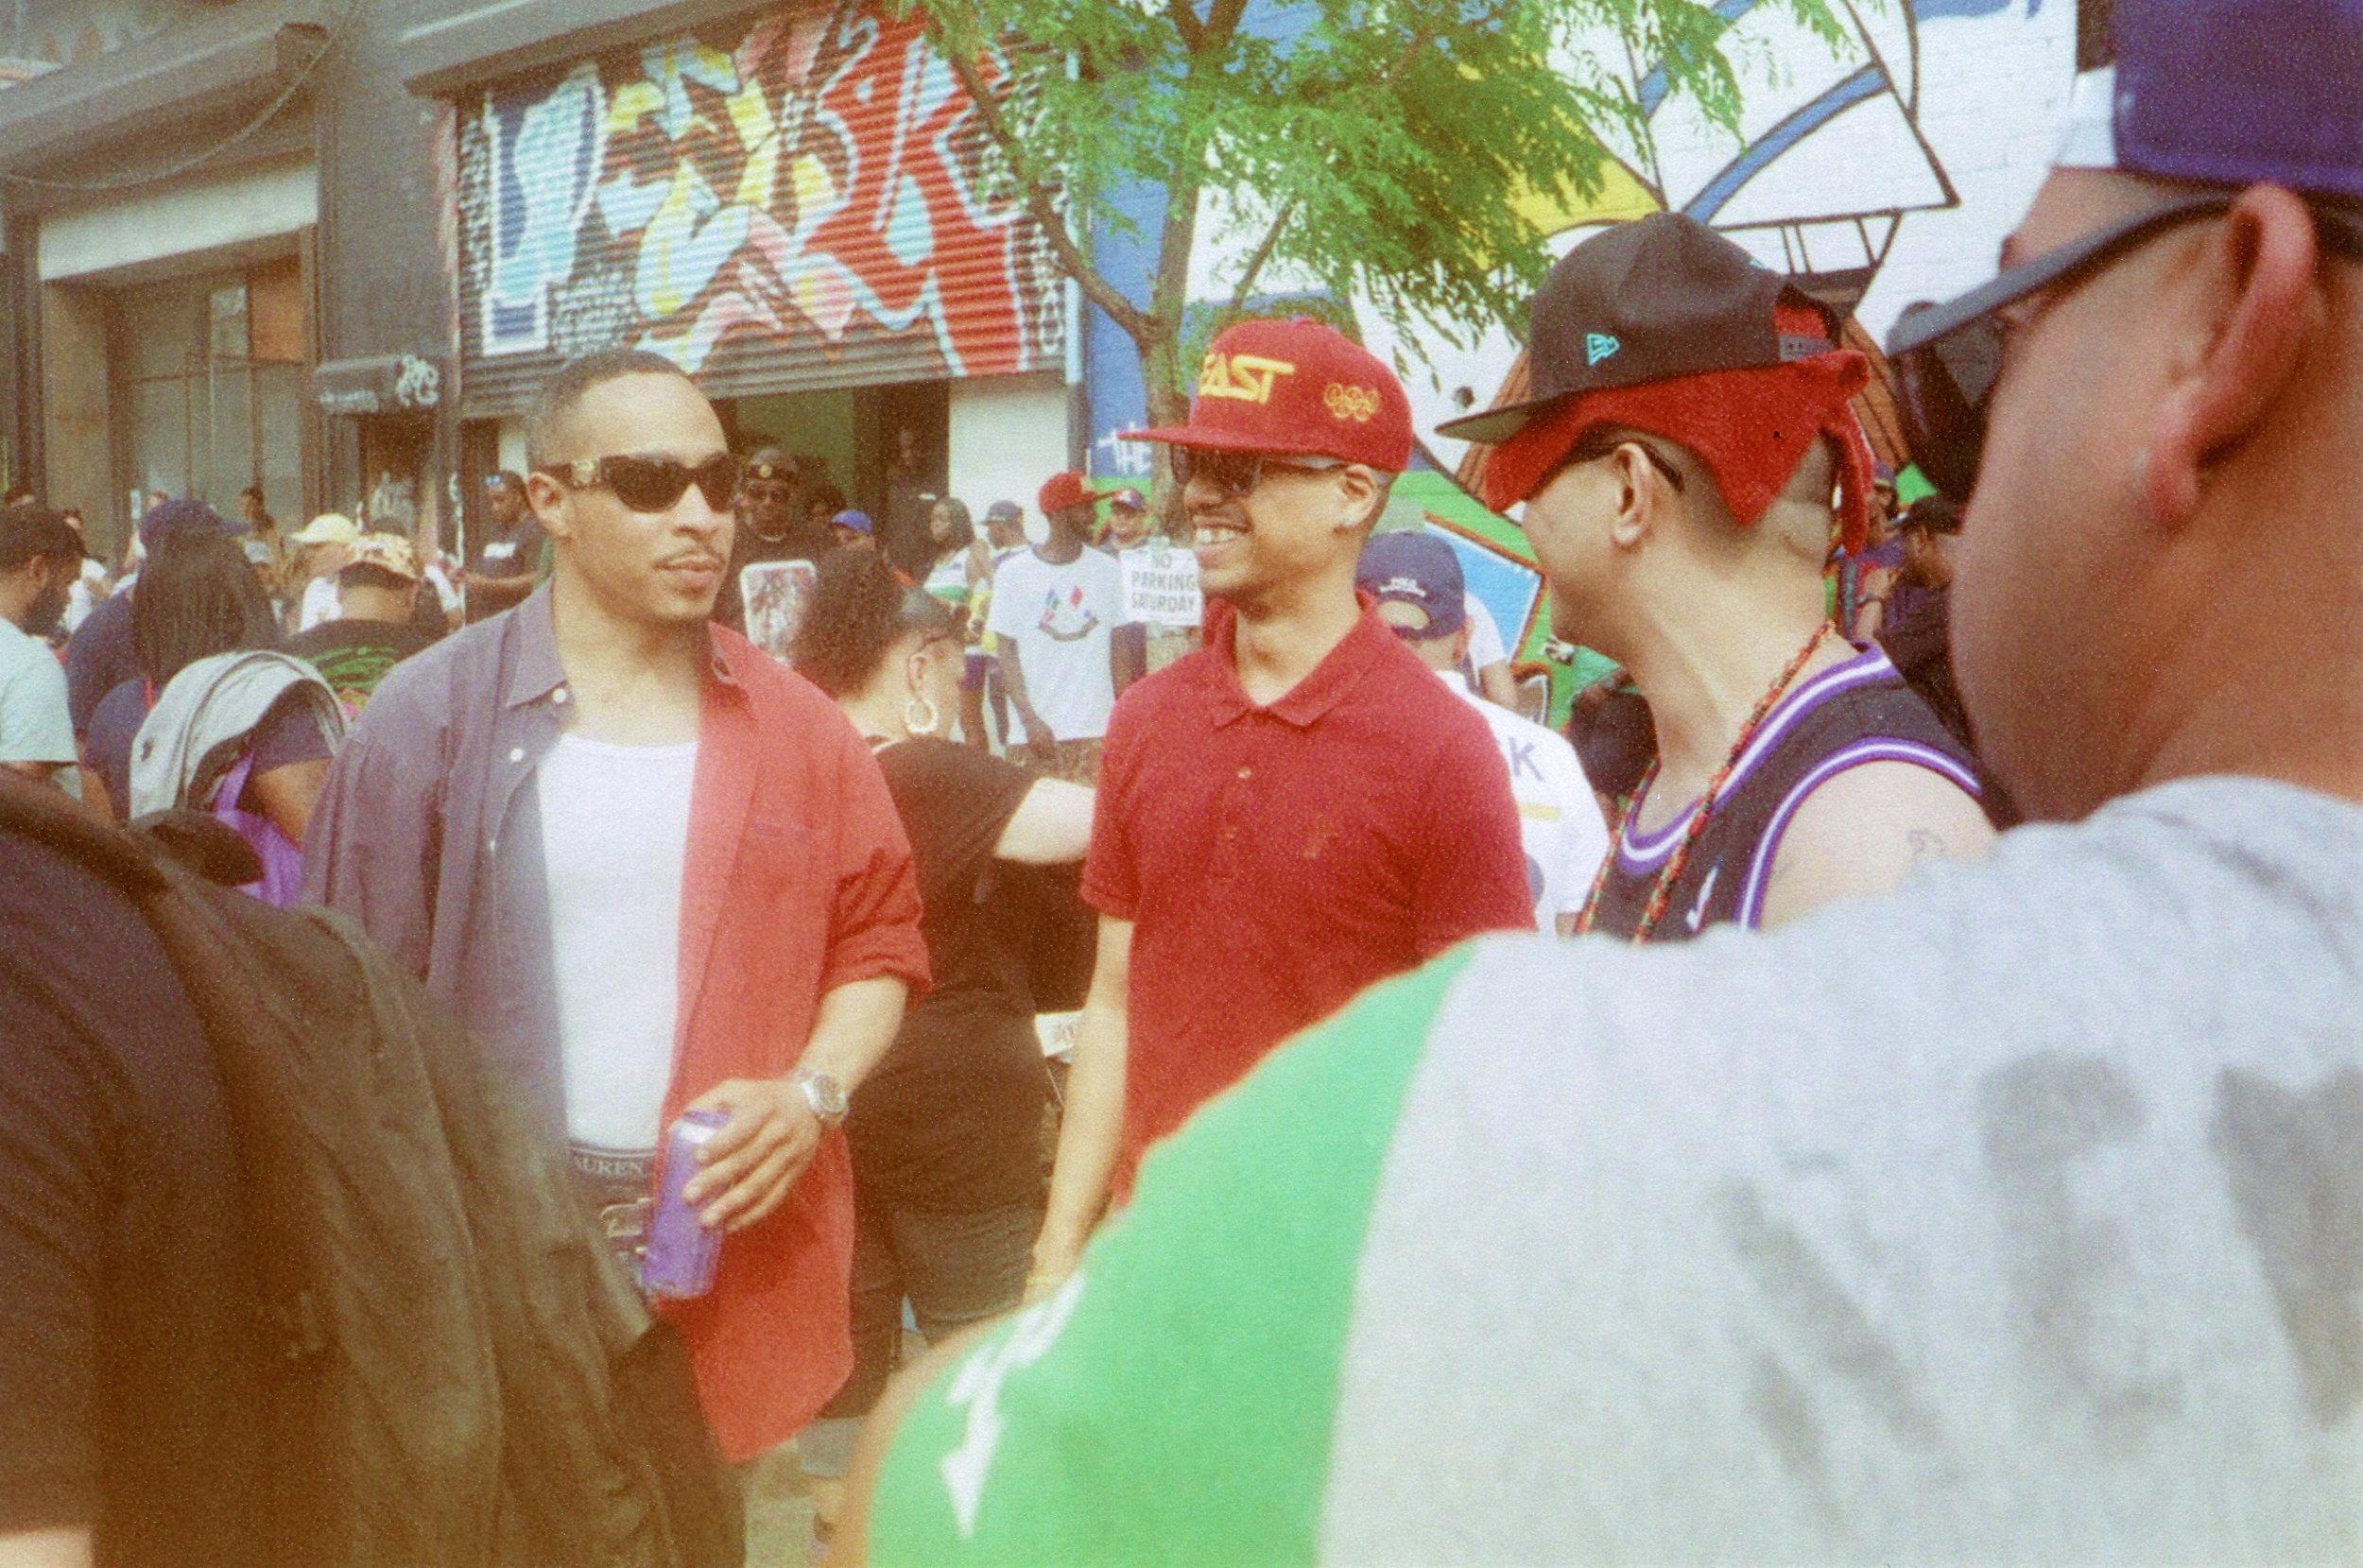 Bushwick_Boys_APS_Luciiferr_NYC__ANALOG__FILM_PHOTOGRAPHER_BROOKLYN_PHOTOGRAPHY_ART_ copy.jpg